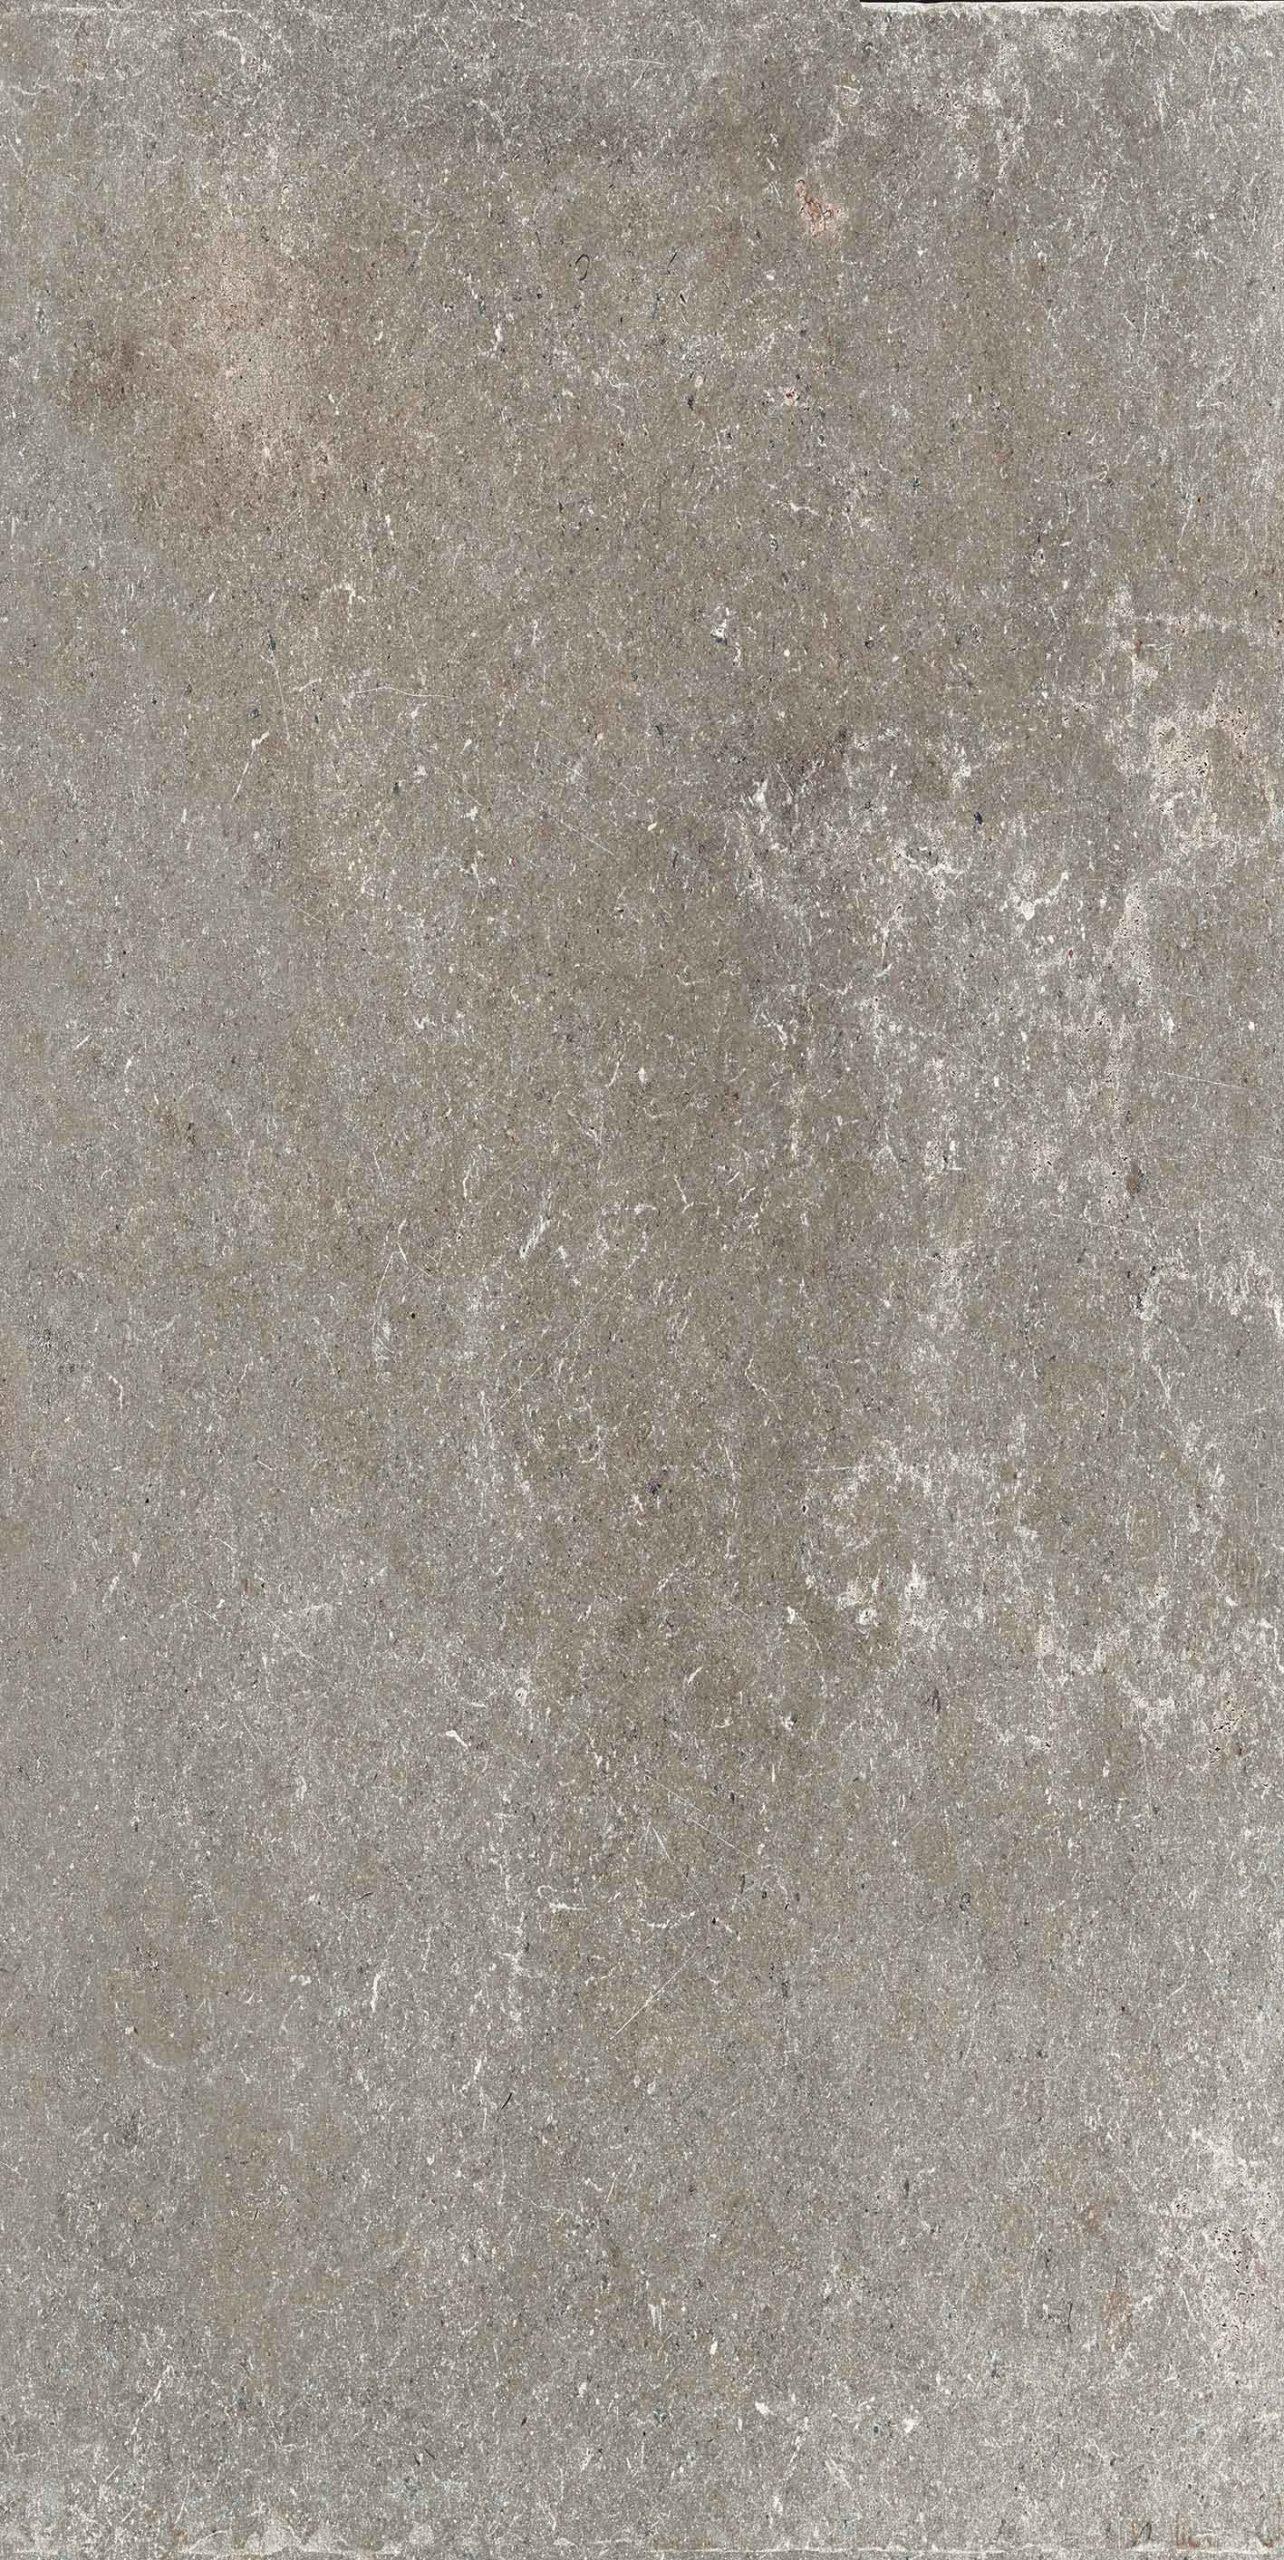 Stontech 4.0 Stone 03 R+PTV 10mm 60 x 120